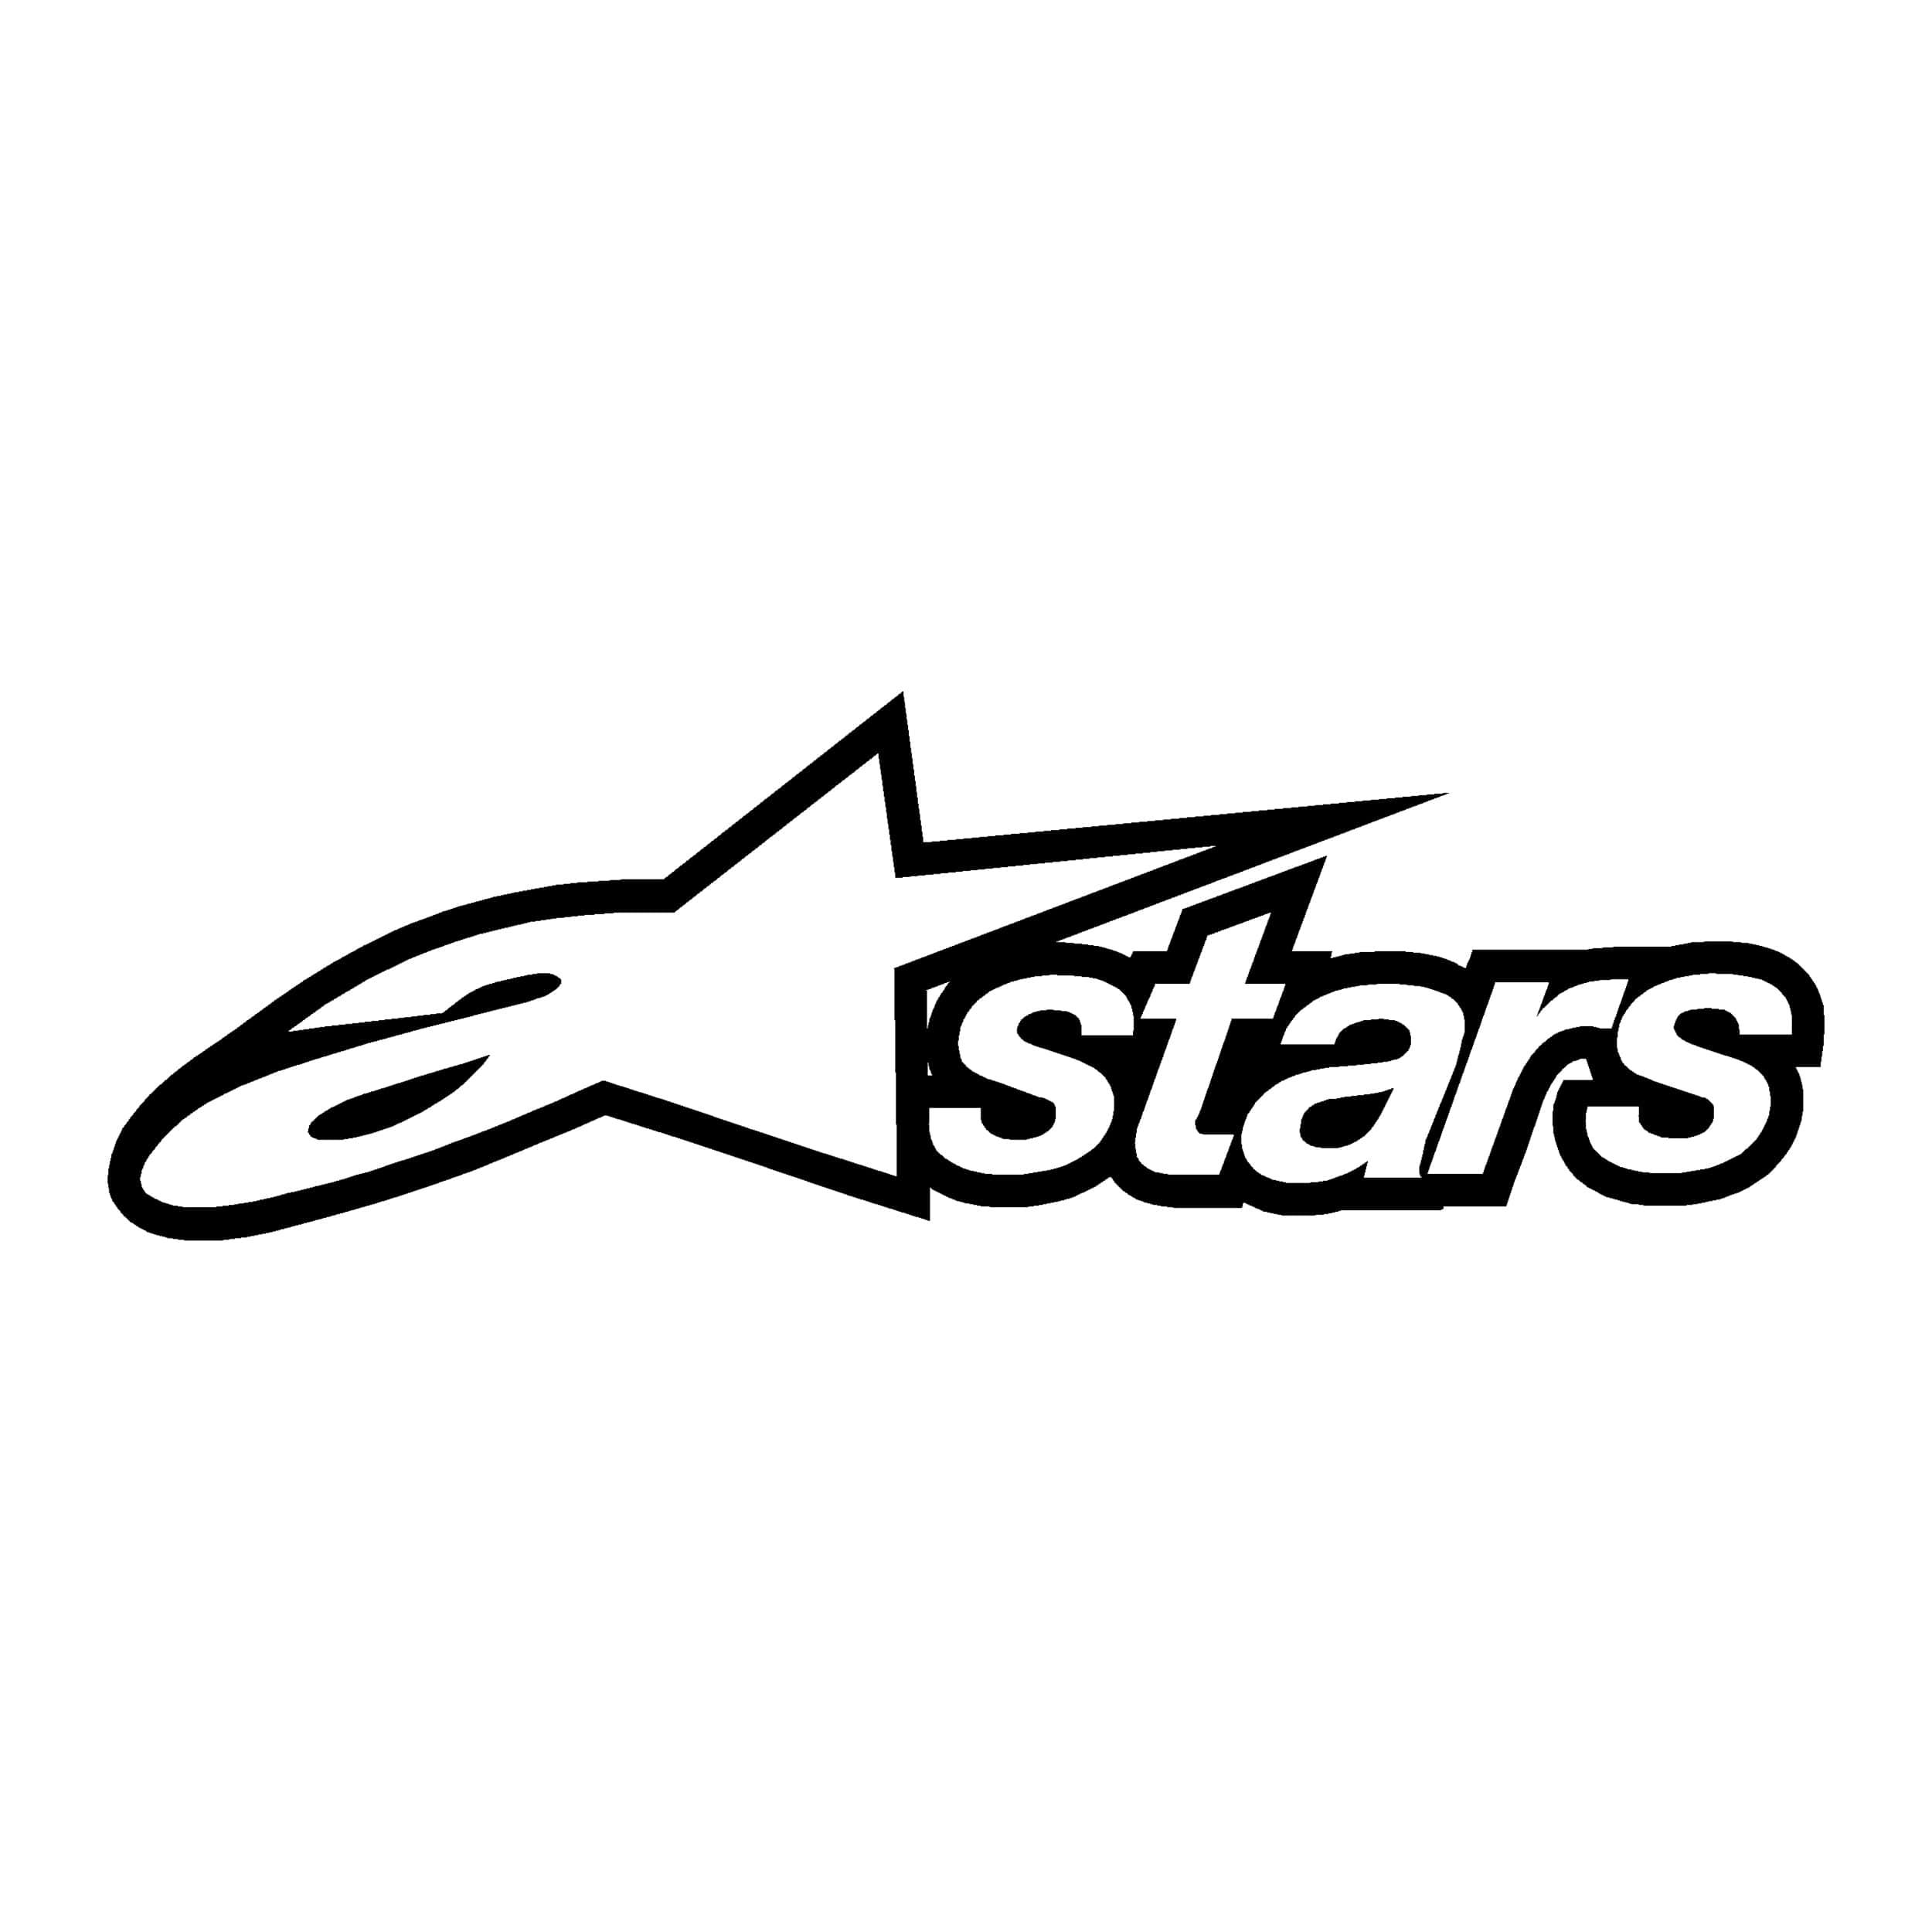 stickers-alpinestars-alpine-stars-ref10-tuning-autocollant-sticker-sponsors-car-auto-moto-camion-bike-velo-vtt-competition-deco-rallye-min